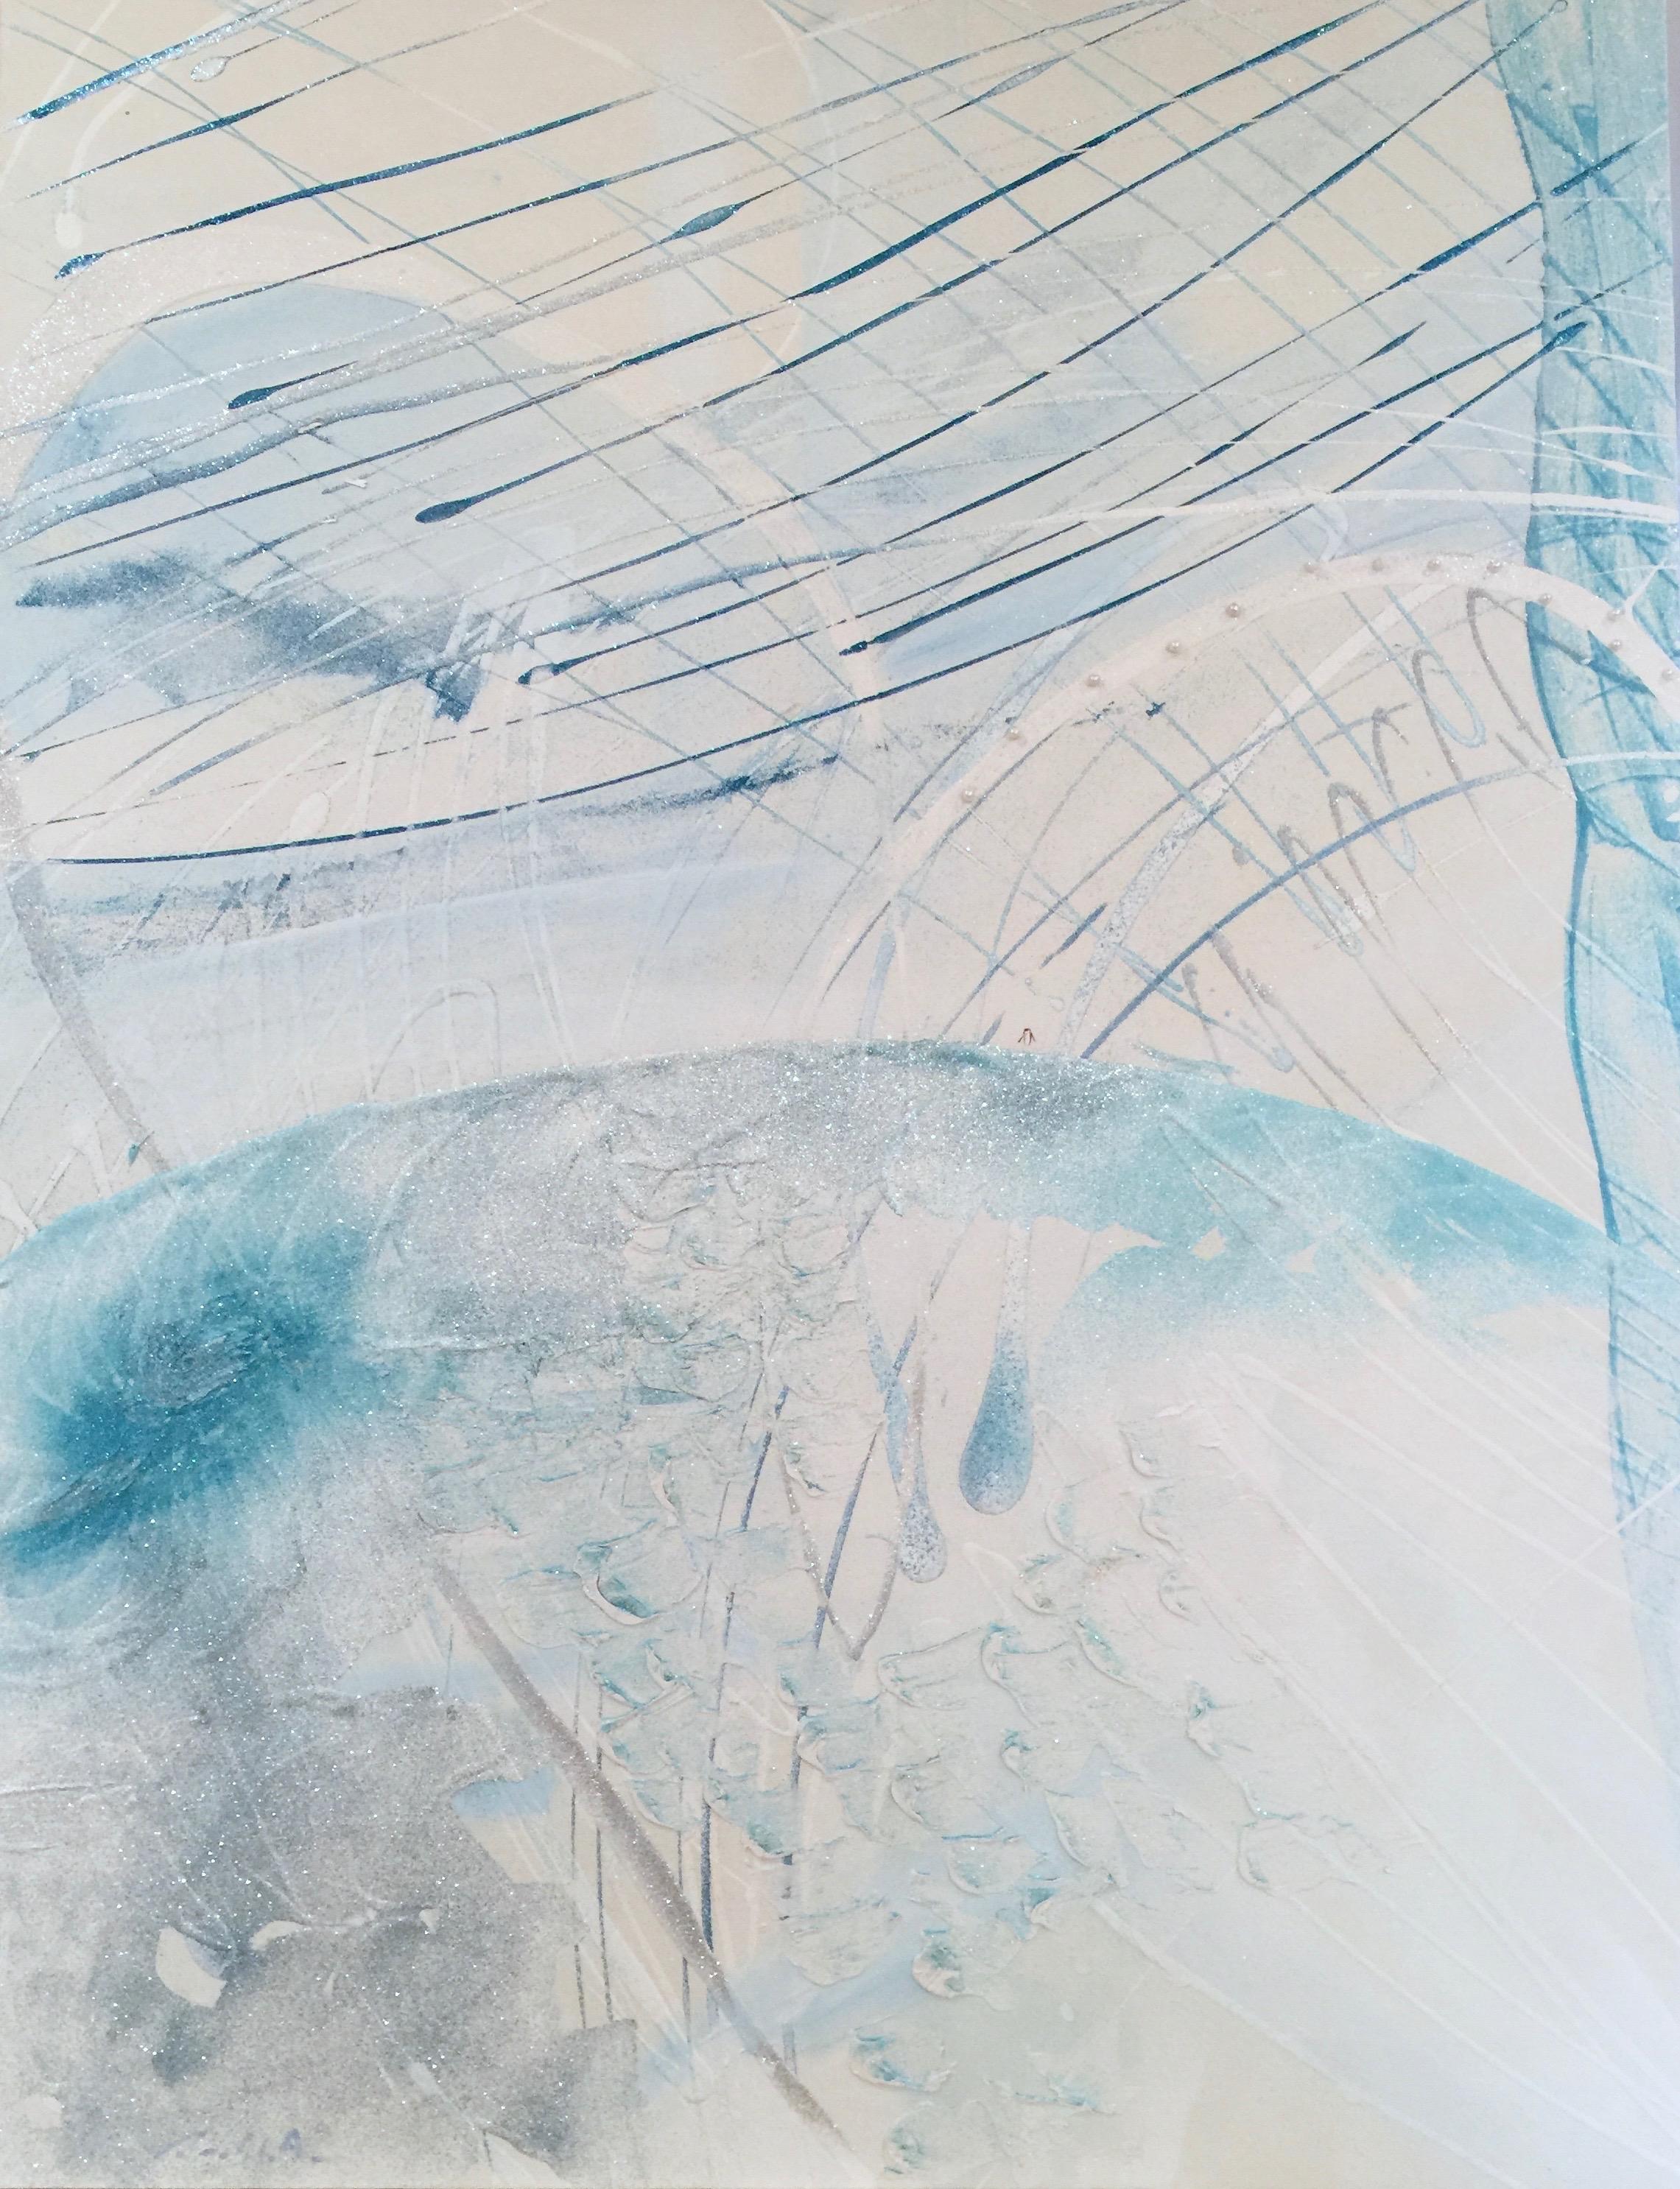 Ice Mountain (The A Little Penguin)   (117 x 91cm)